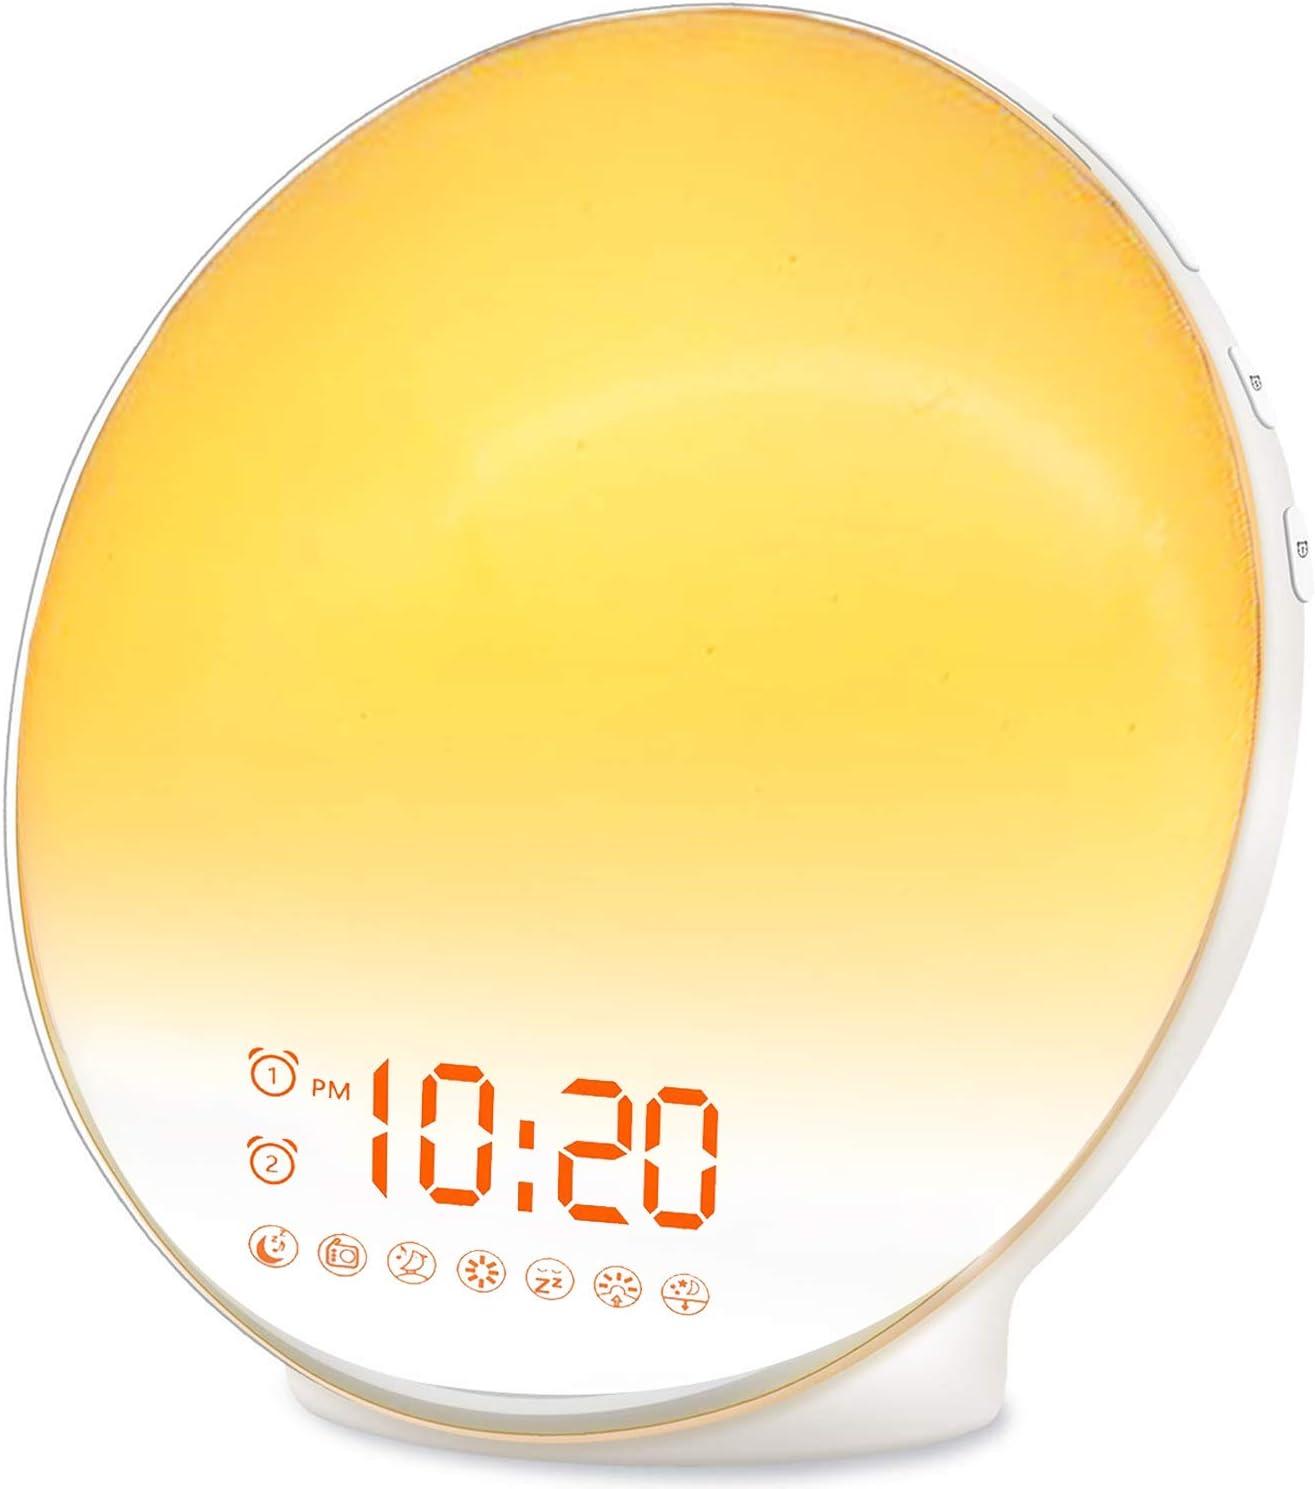 JALL 7Colors,7Natural Sounds Wake Up Light Sunrise Alarm $34 Coupon